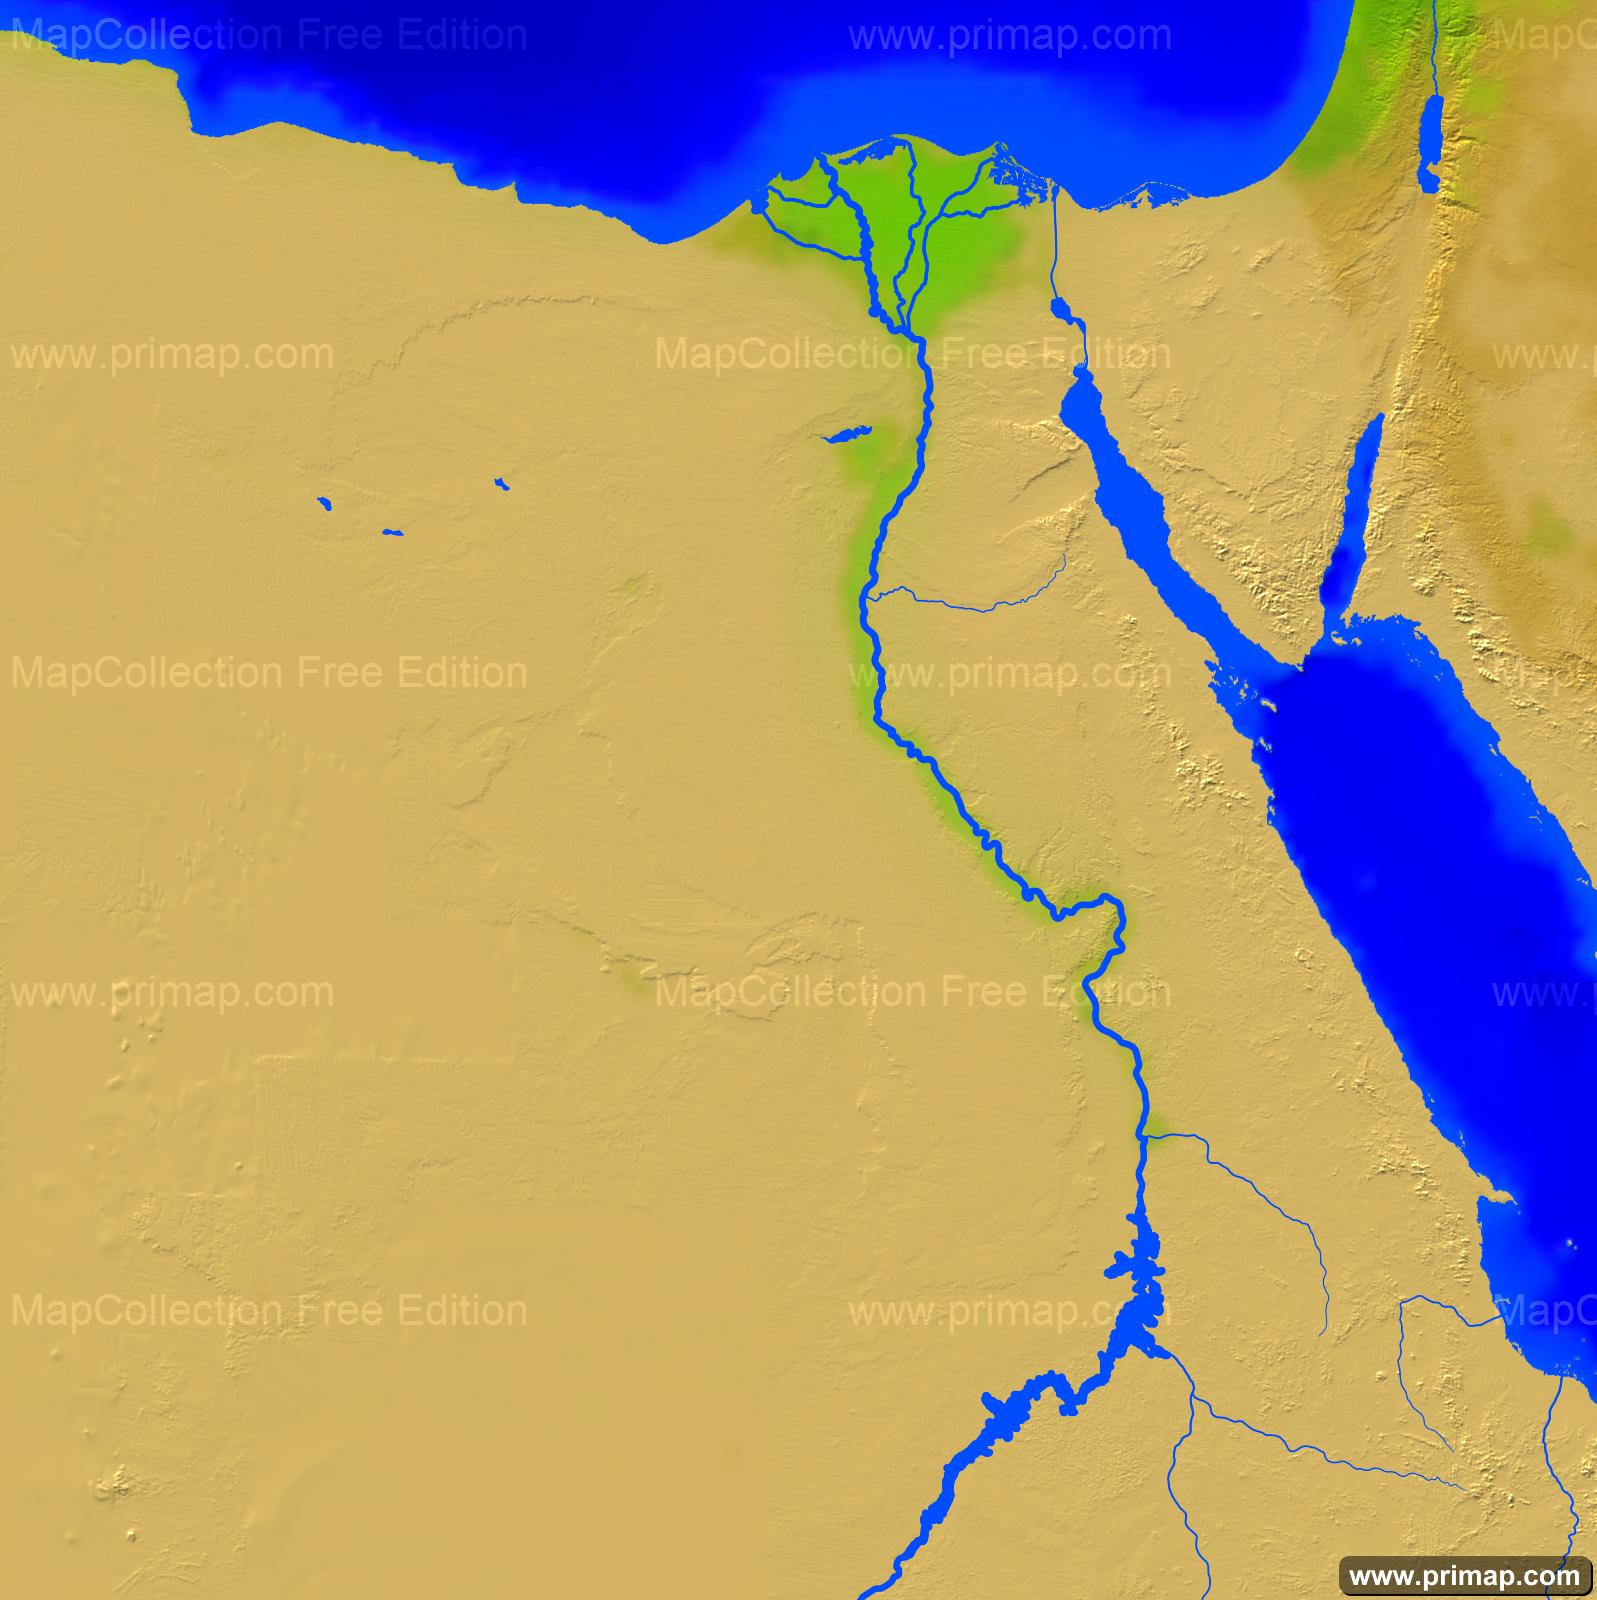 Primap National Maps - Vegetation map of egypt